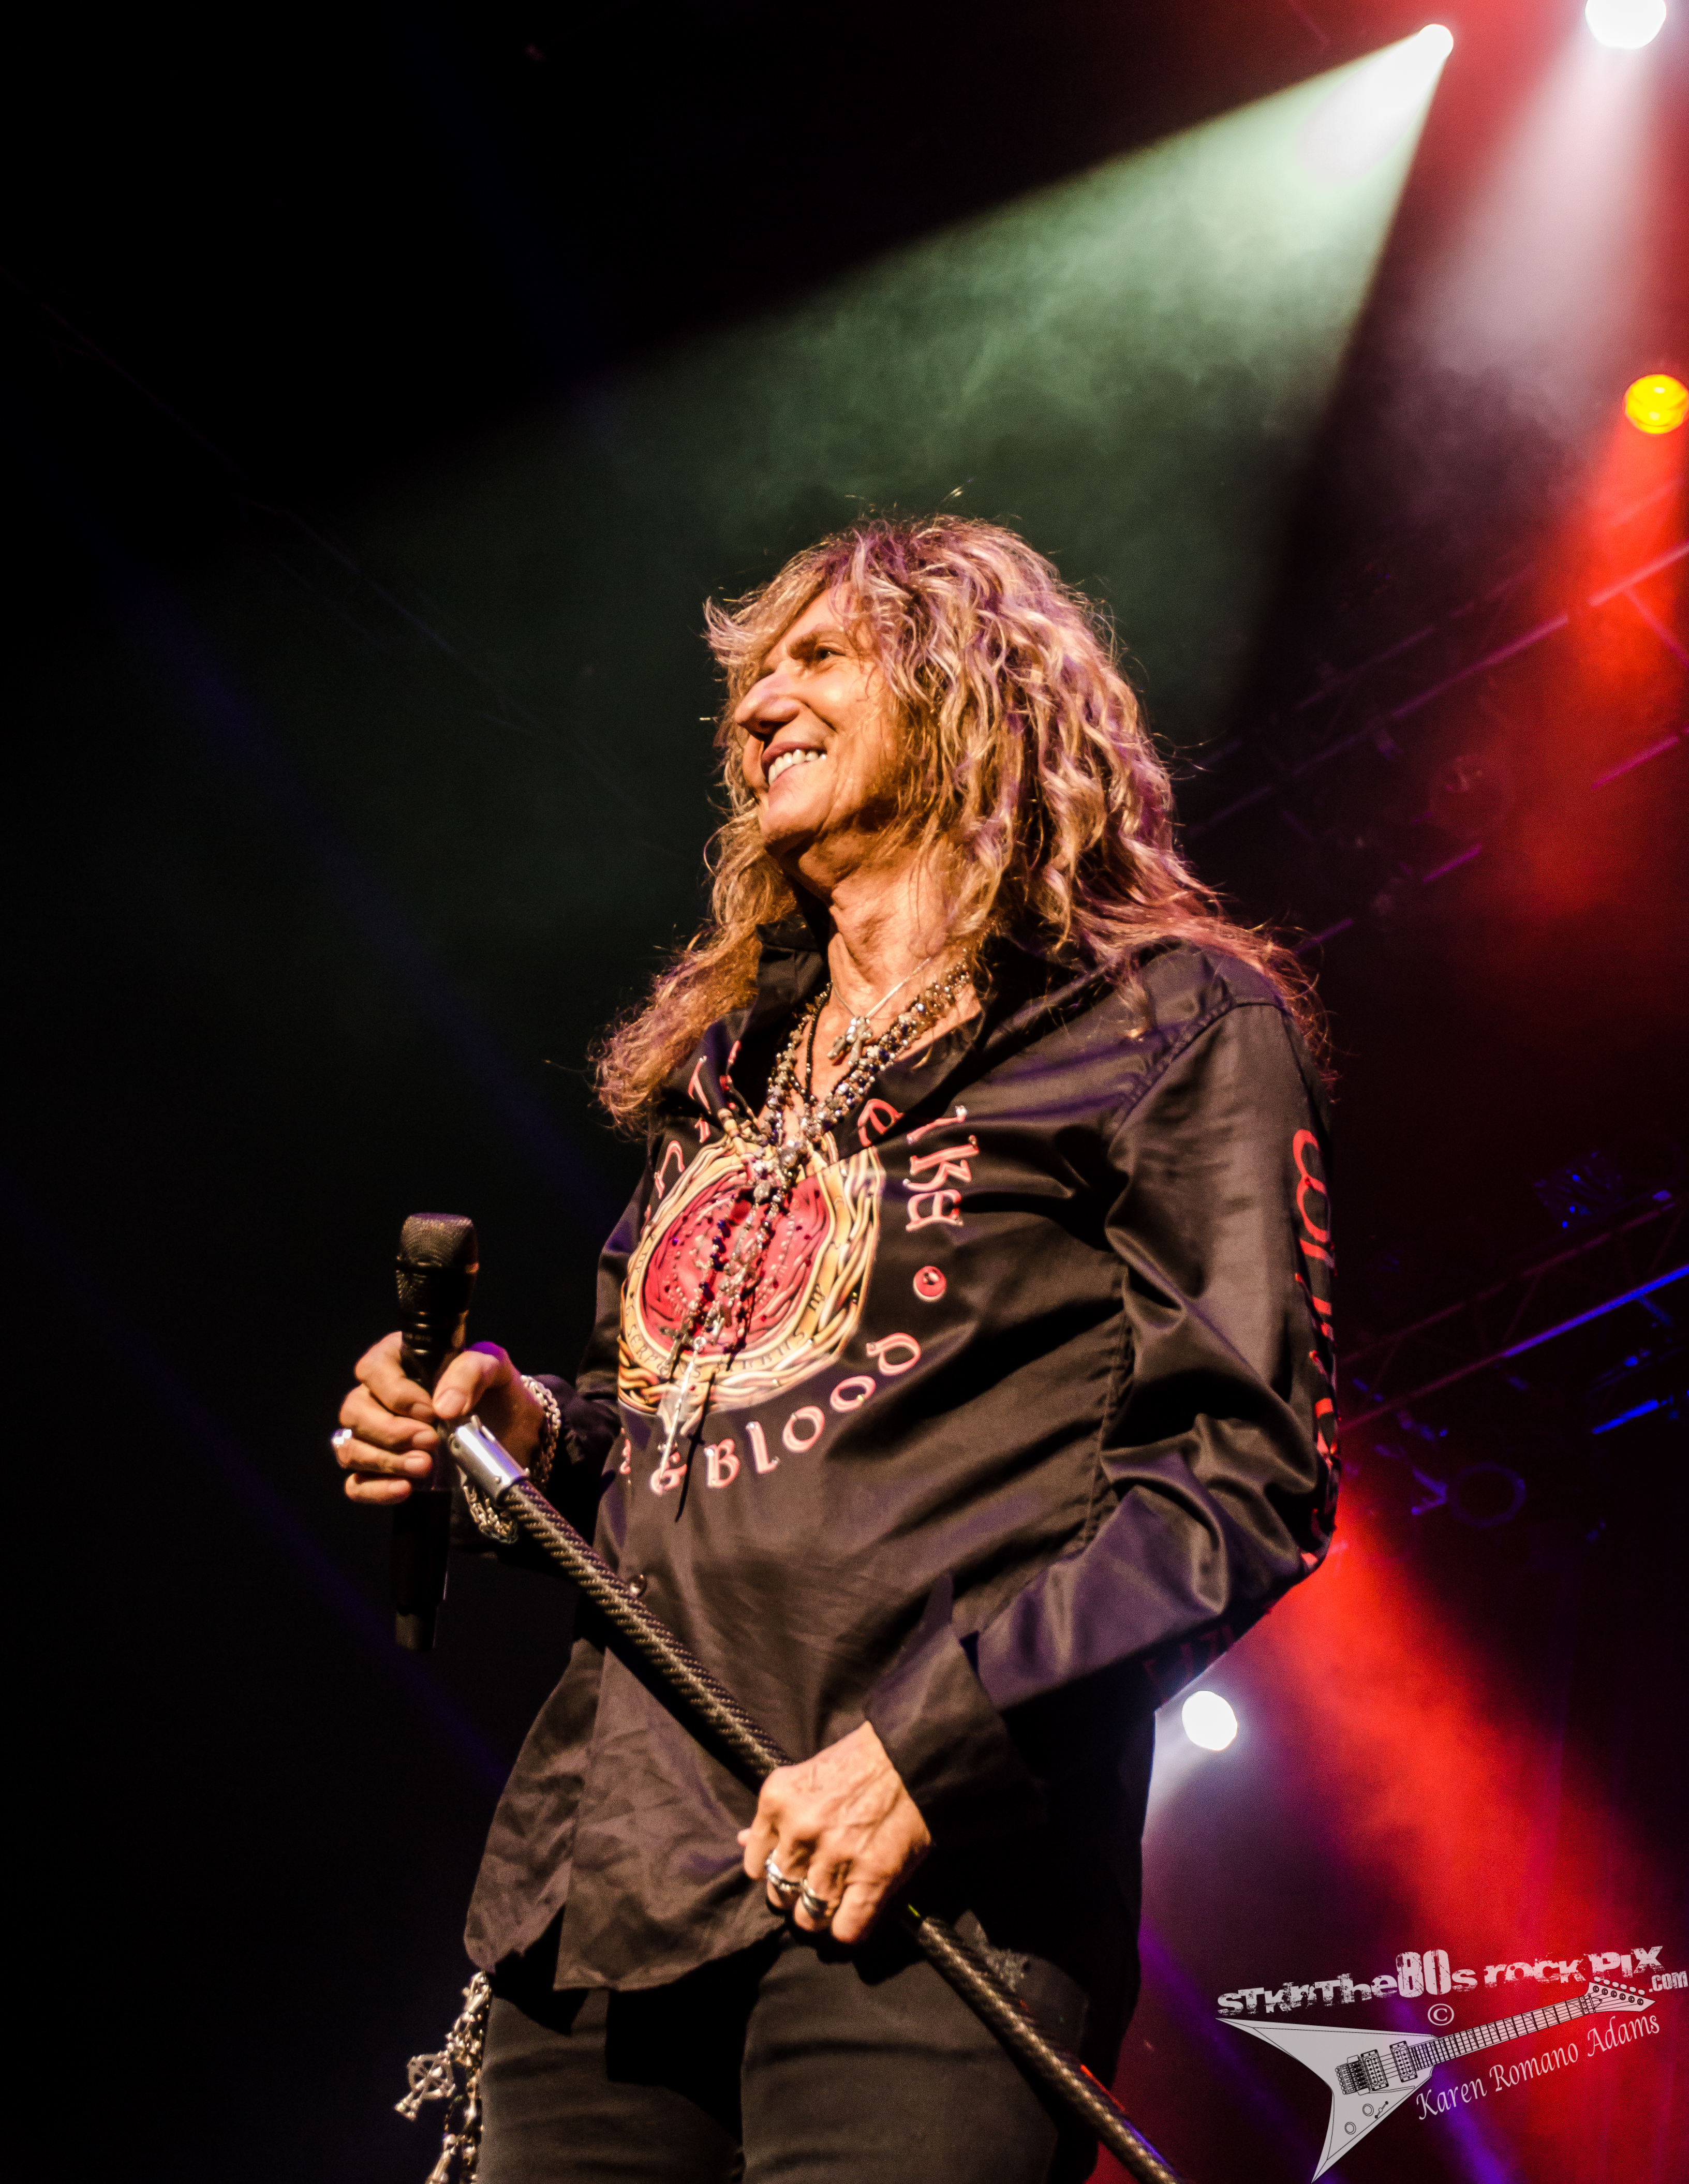 Whitesnake at Hard Rock Live 4-19-40